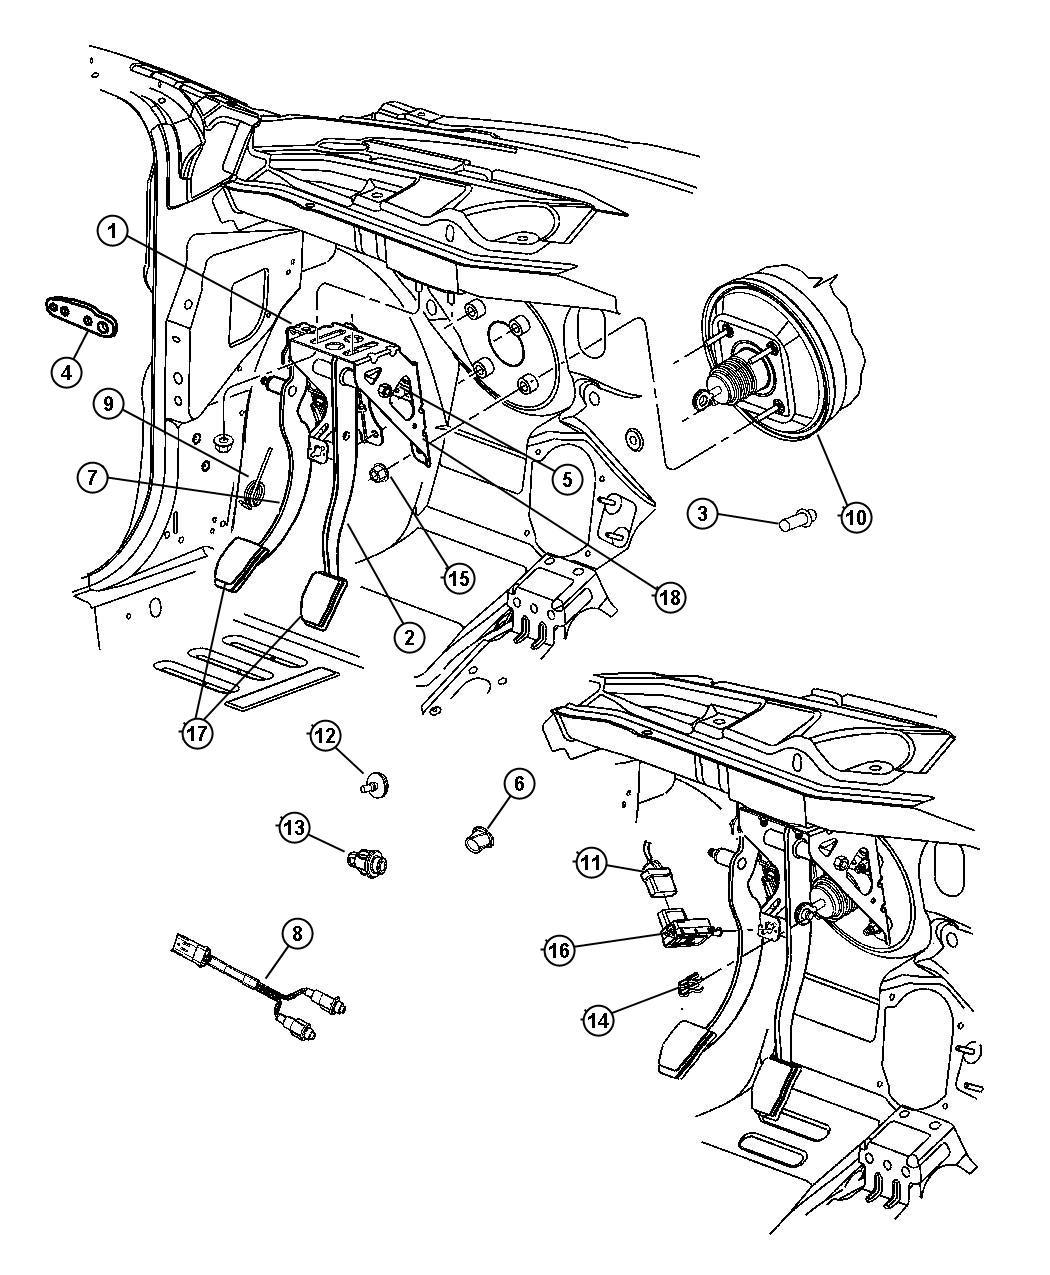 Chrysler Pt Cruiser Spring Clutch Pedal Return With